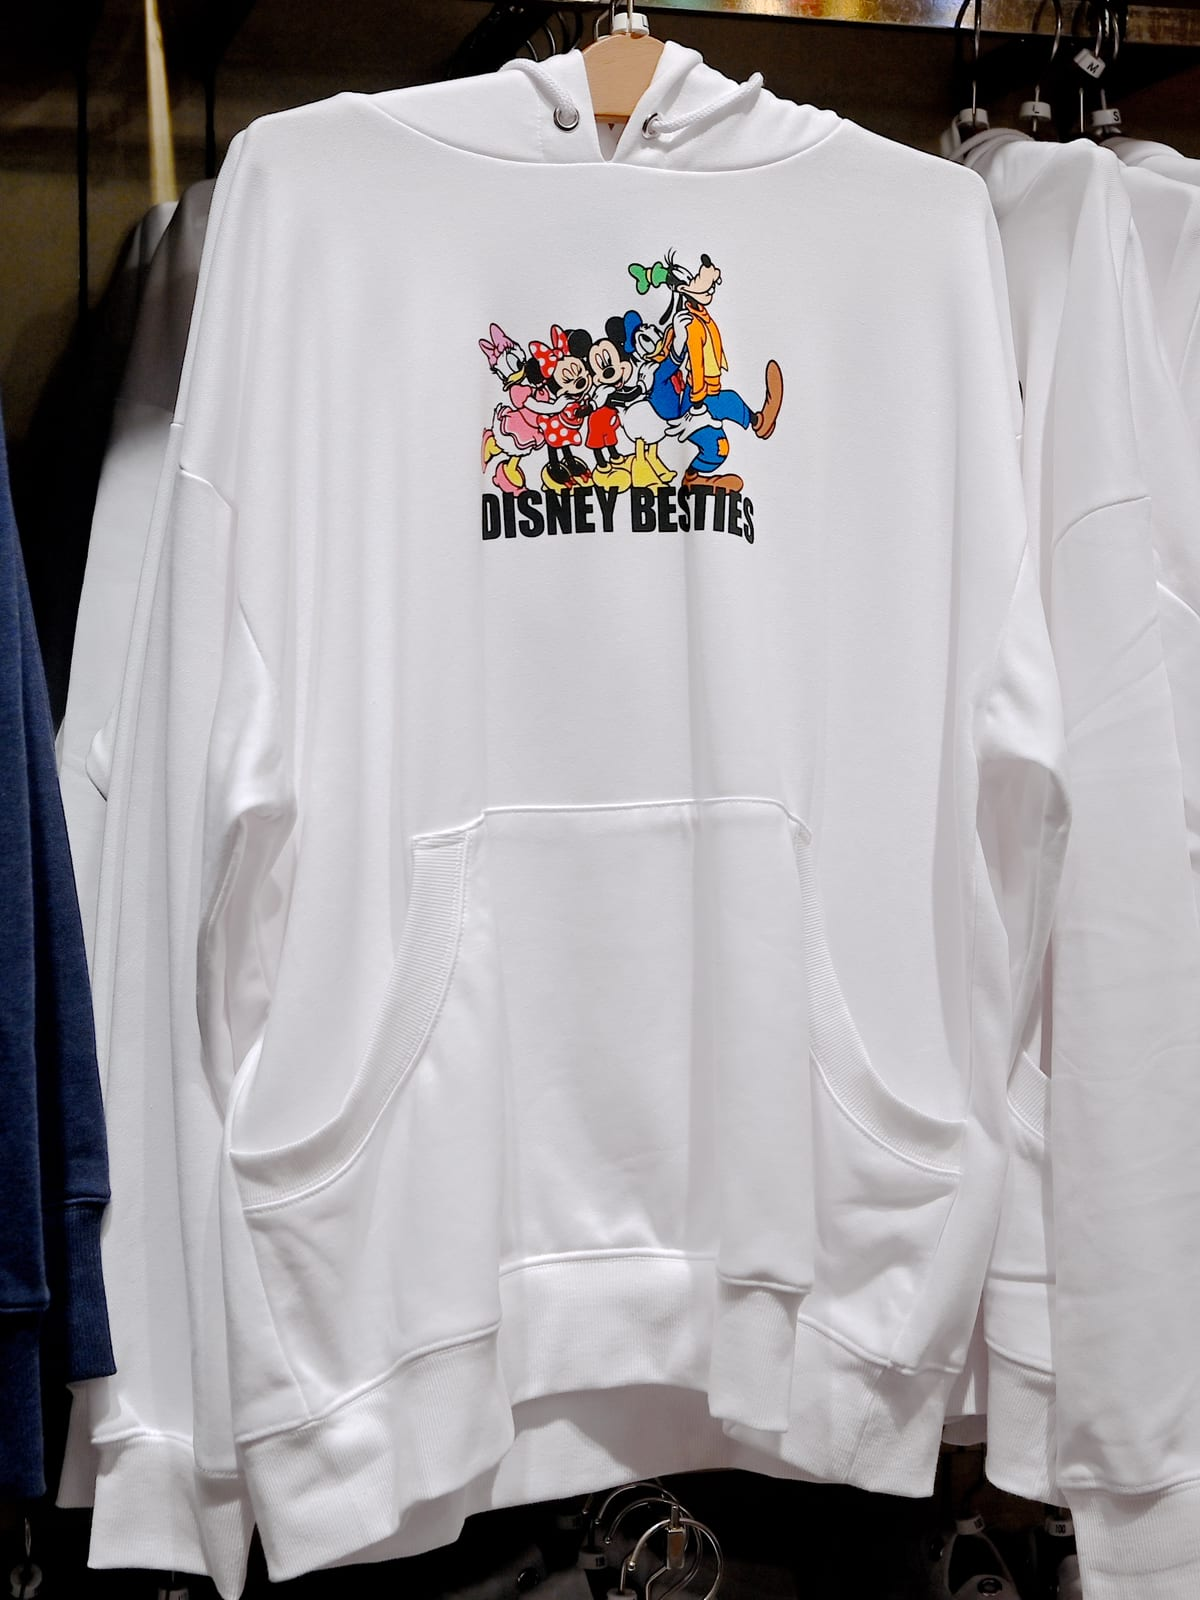 Disney Bestiesパーカー